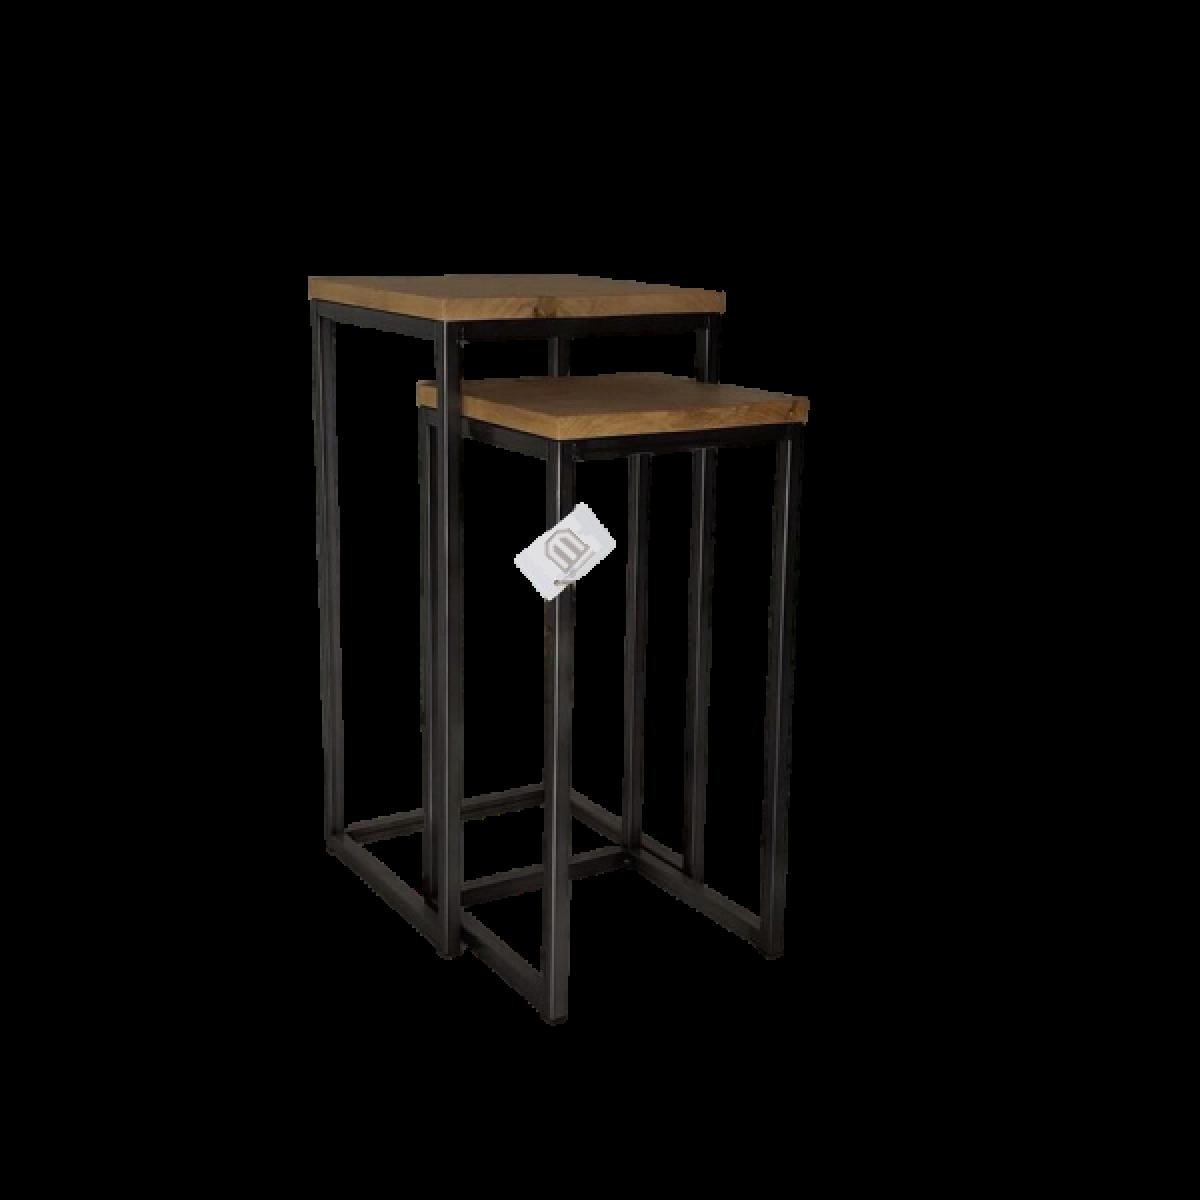 plantentafel-kolom-set-van-2-metaalframe-eiken-blad